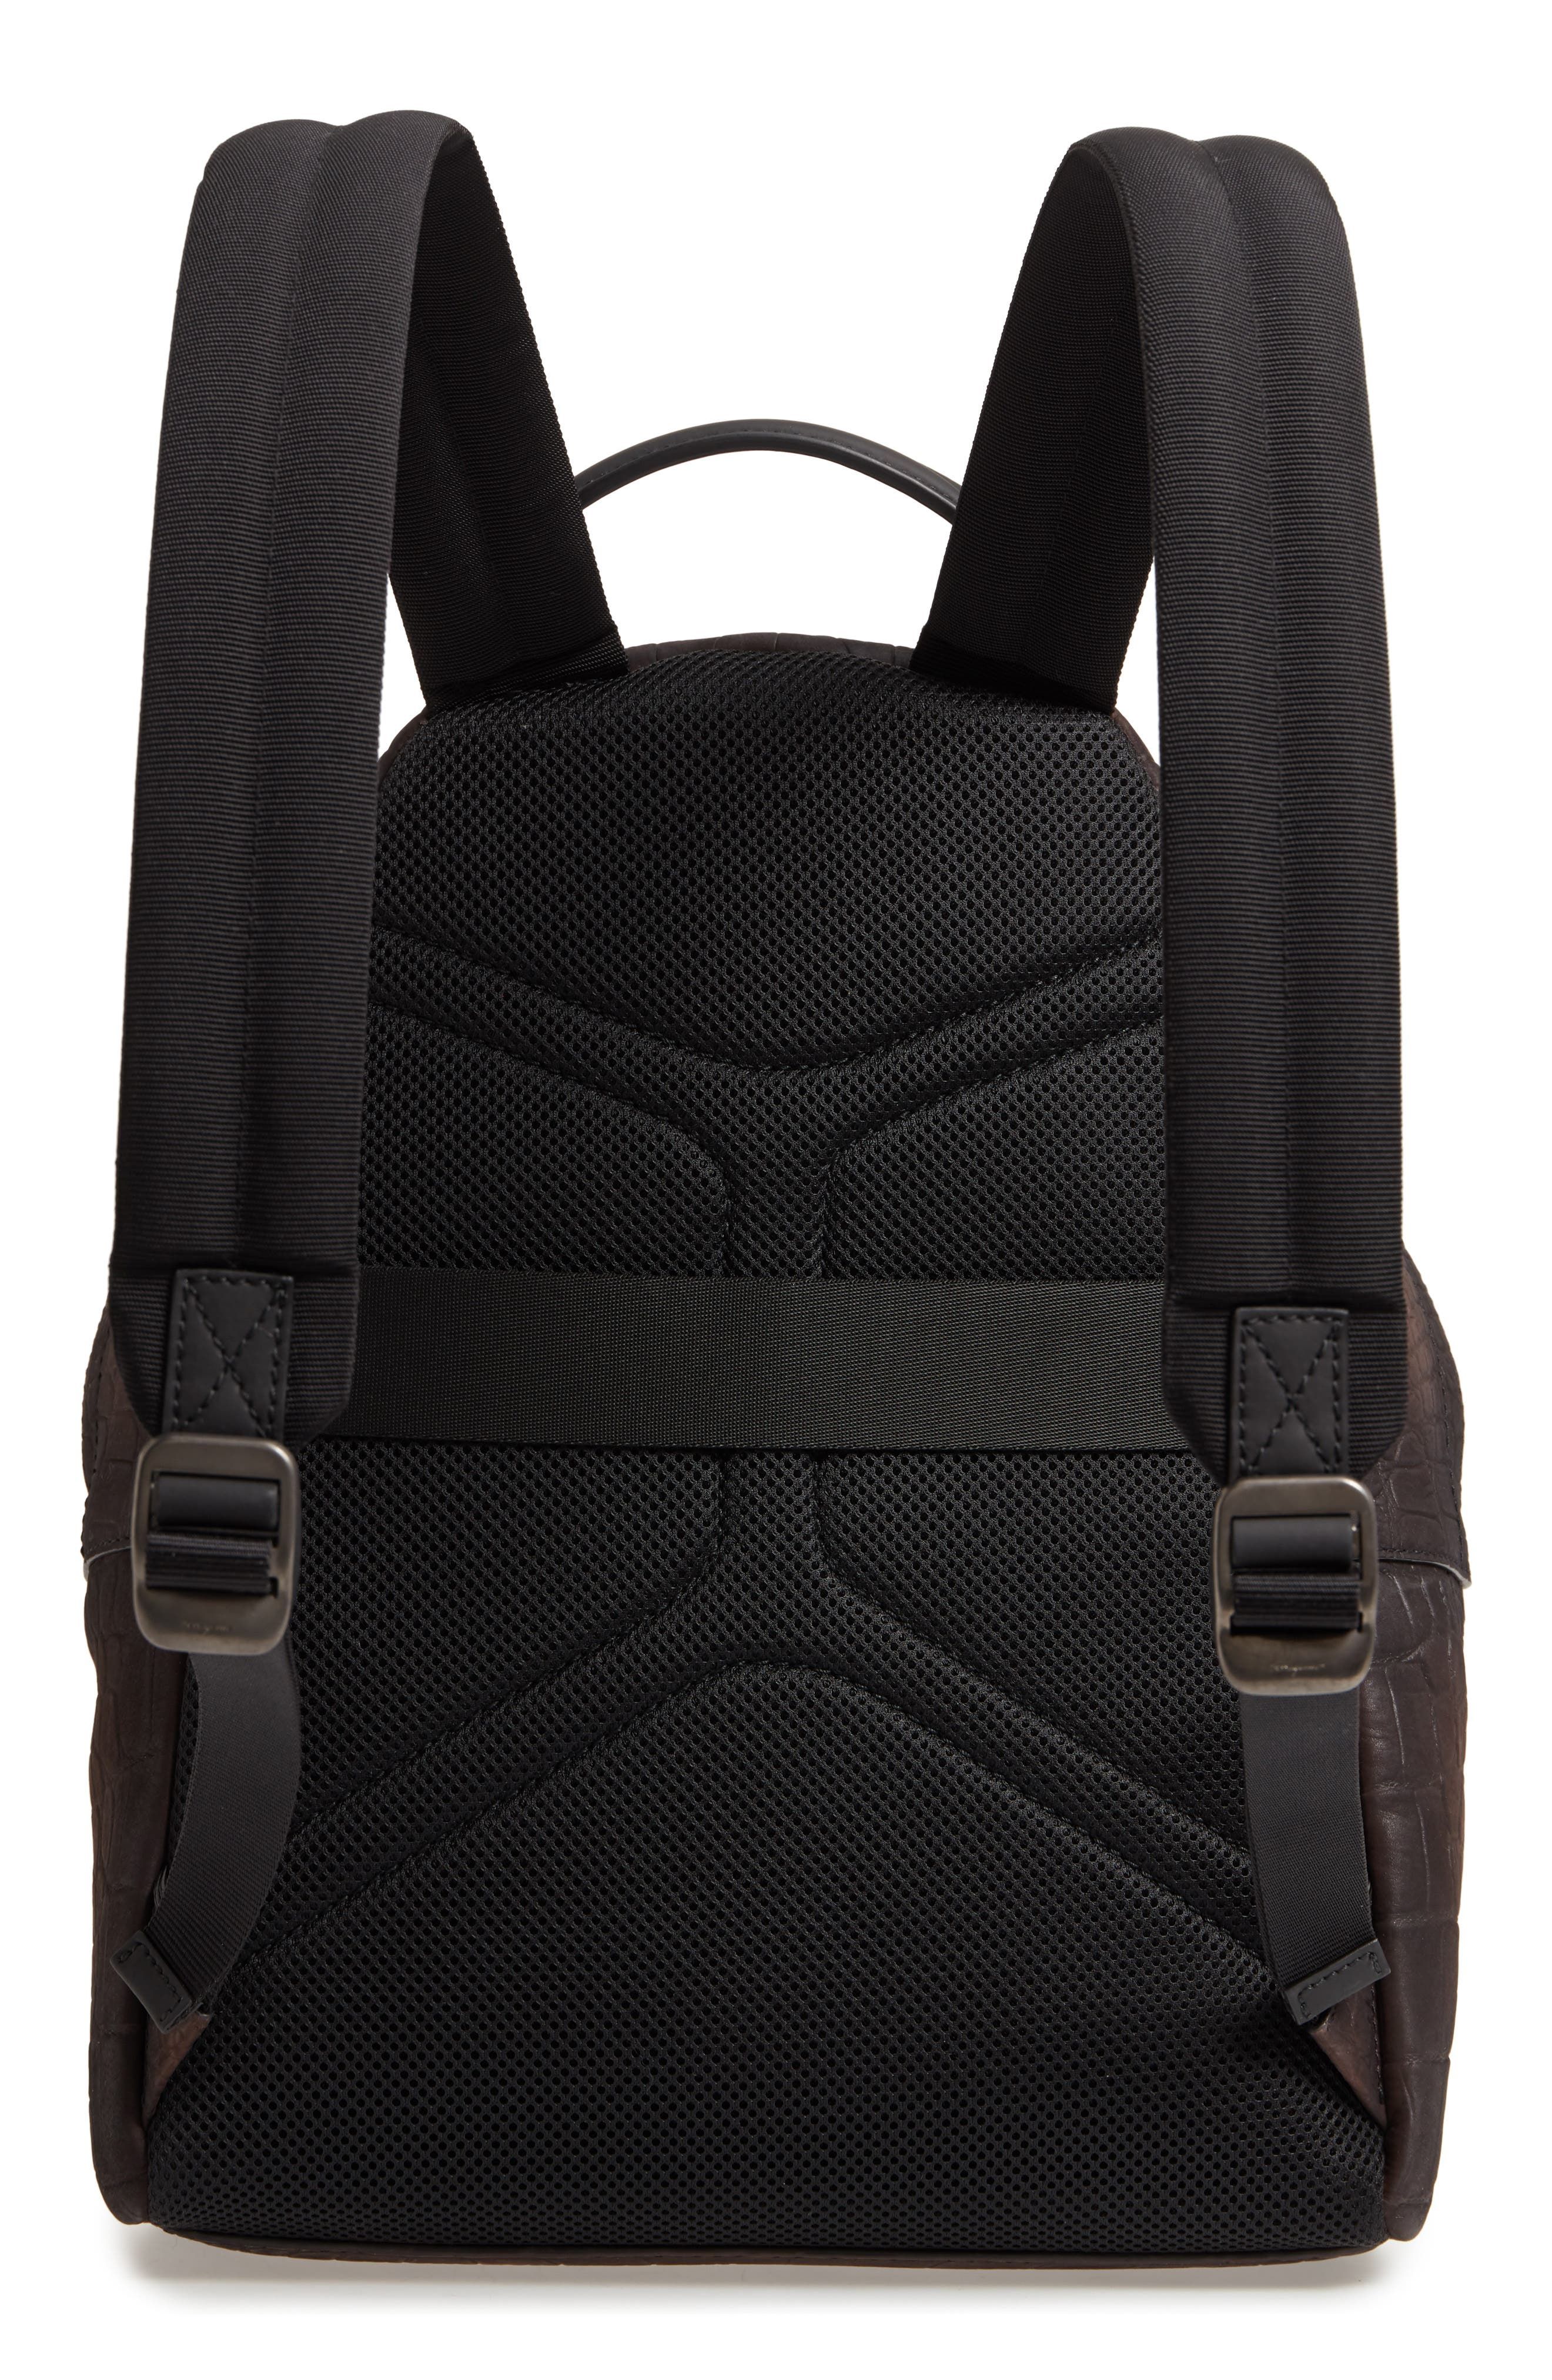 Firenze Leather Backpack,                             Alternate thumbnail 3, color,                             Moro